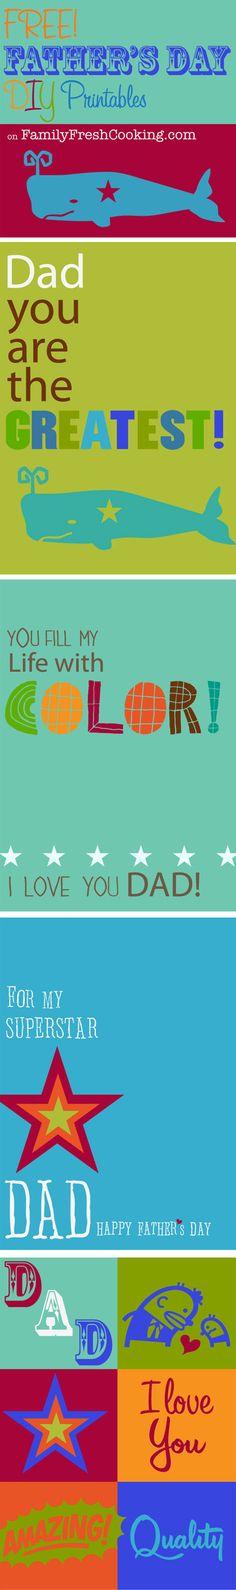 *FREEBIE* Father's Day Printable Cards on FamilyFreshCooking.com © MarlaMeridith.com #DIY #Crafts